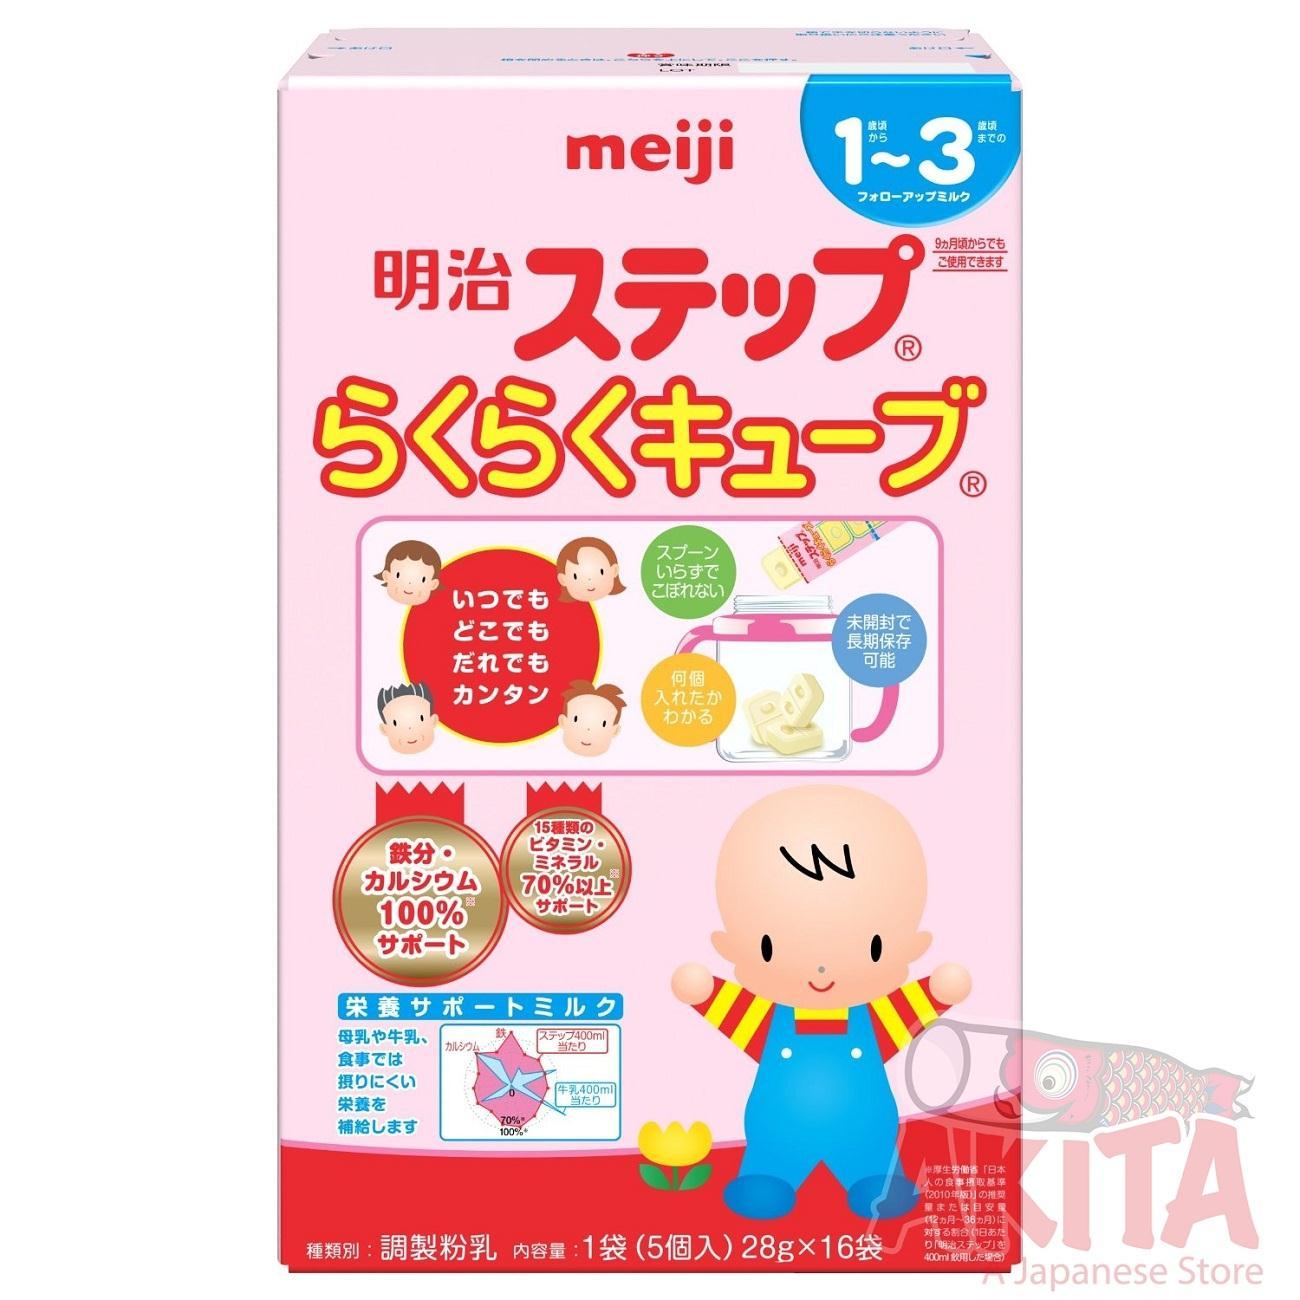 Sữa Meiji 1-3 (hộp 24 thanh)